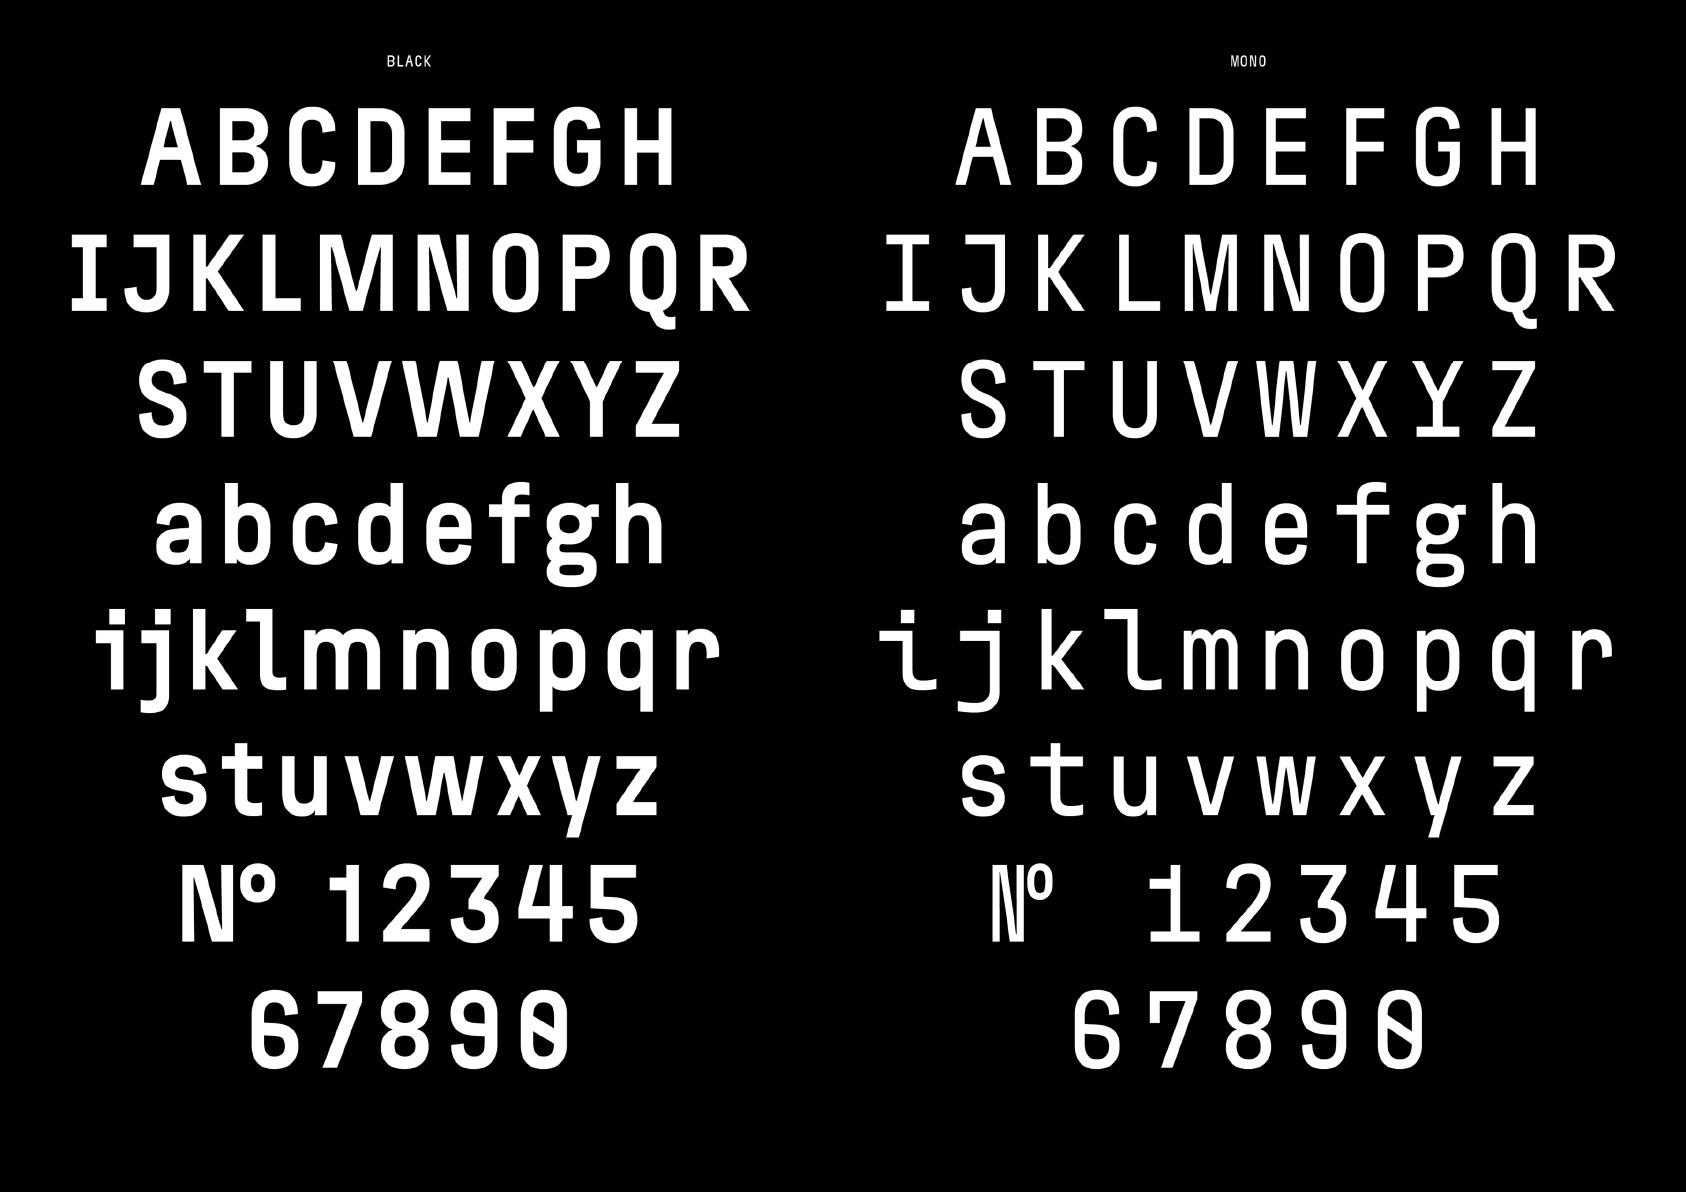 Norebo_ADCR_typeface-3